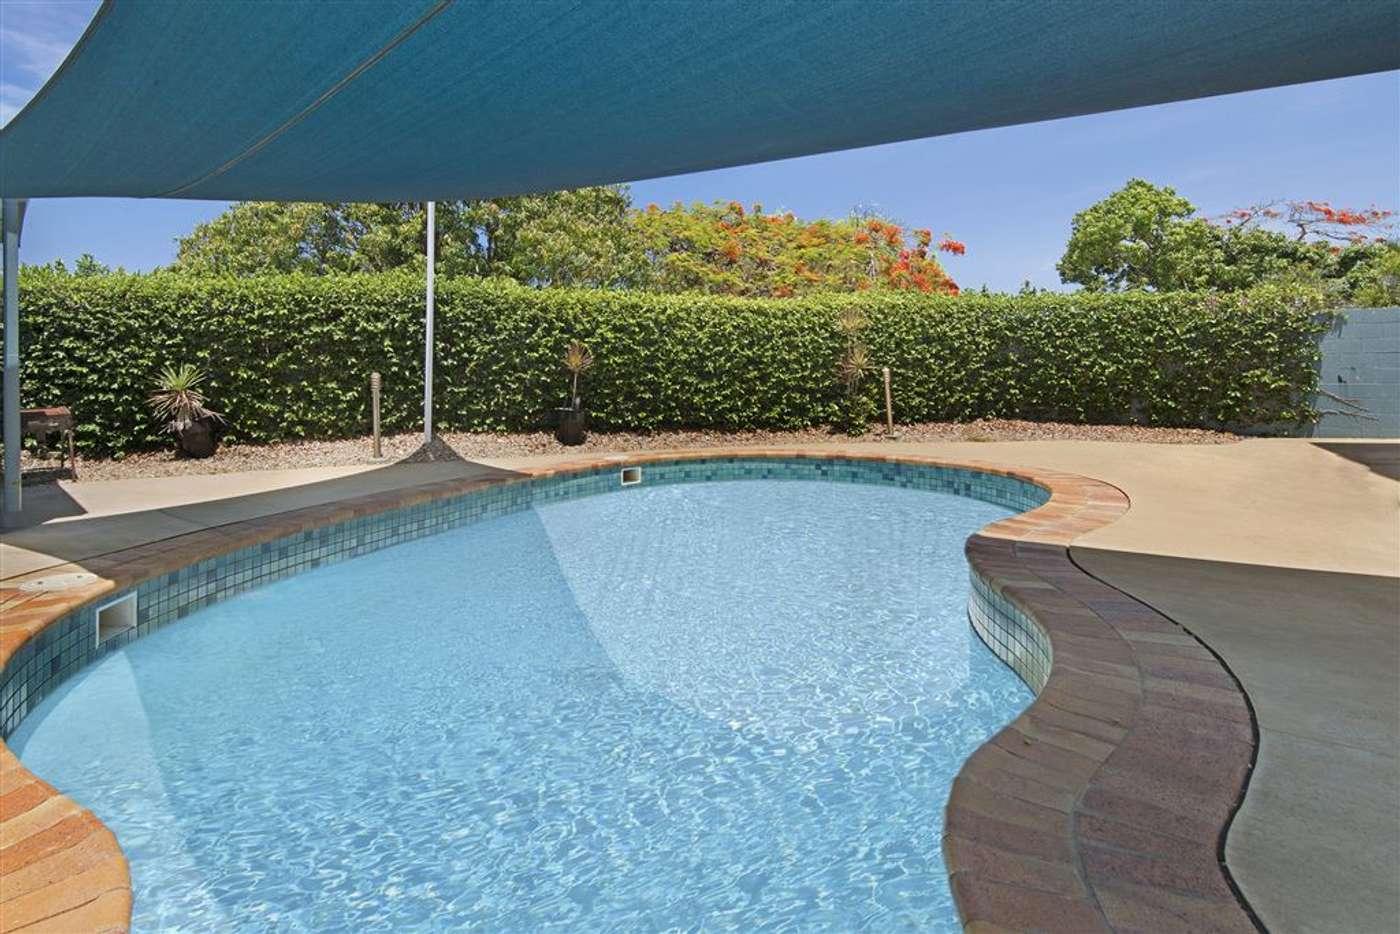 Main view of Homely unit listing, 9/21-23 Landsborough Street, North Ward QLD 4810